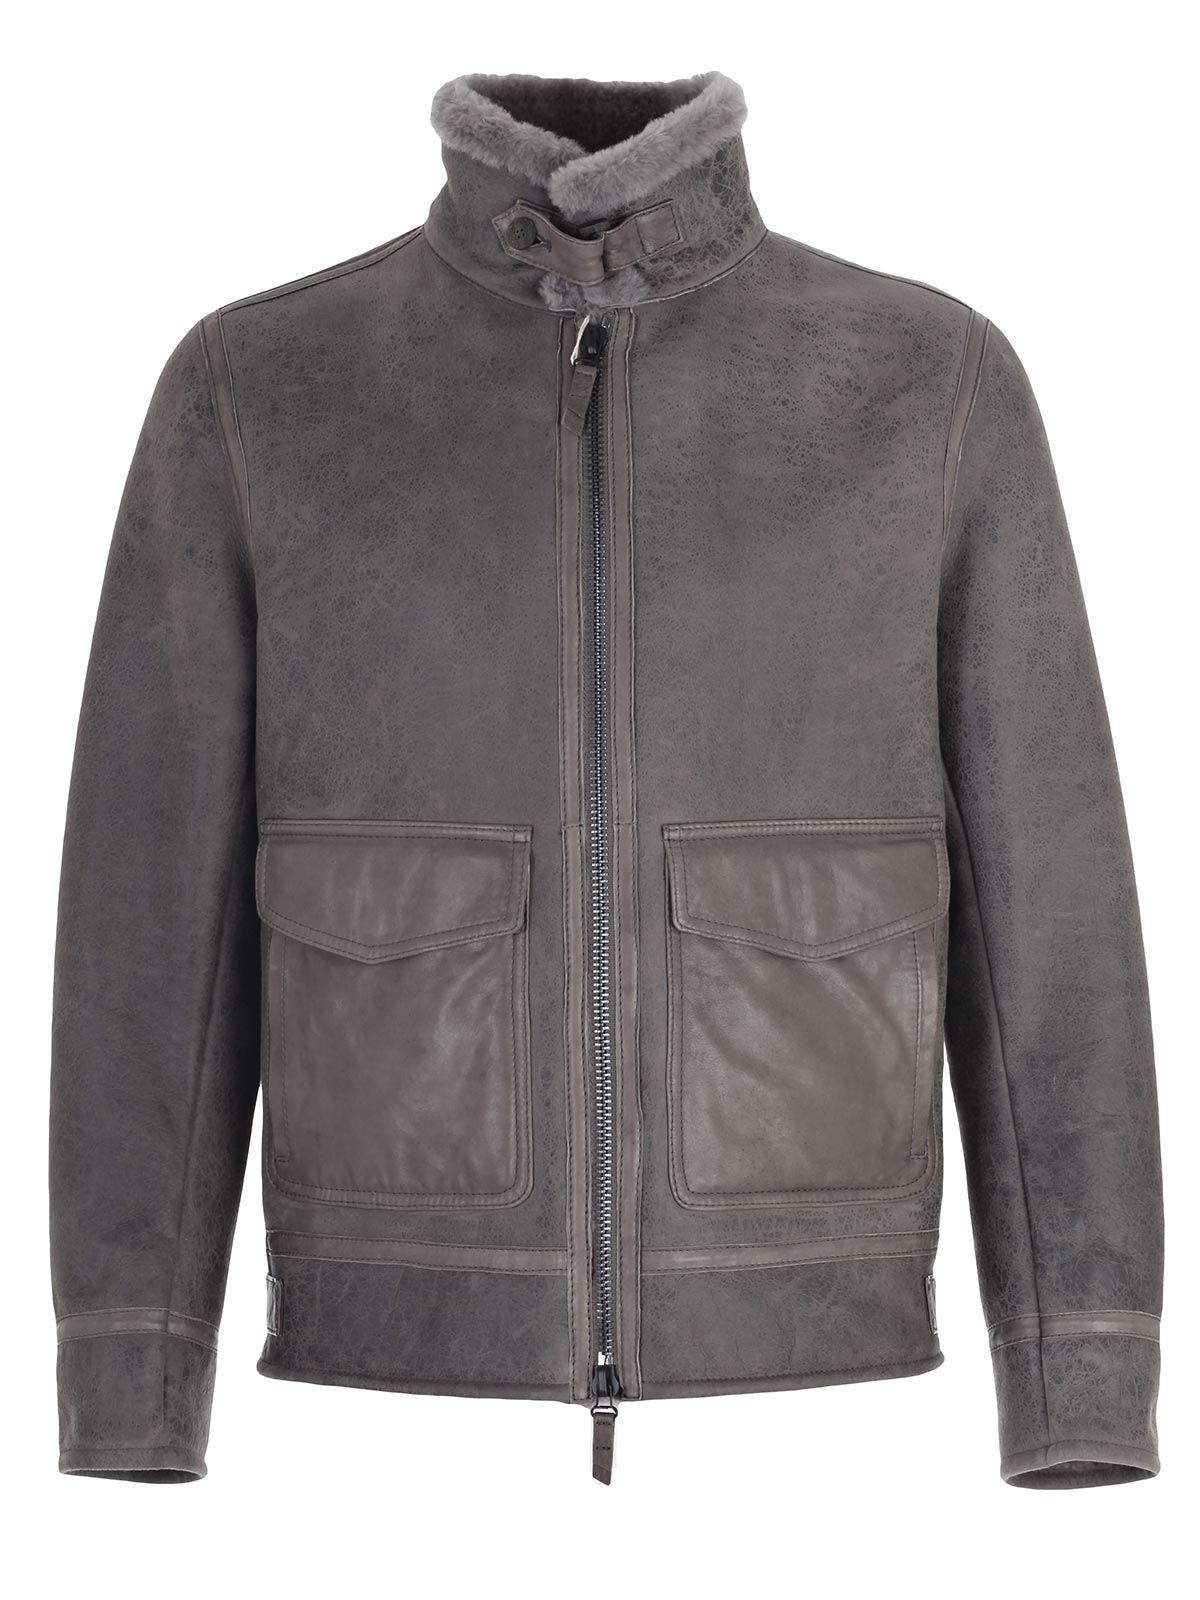 GMS-75 Jacket